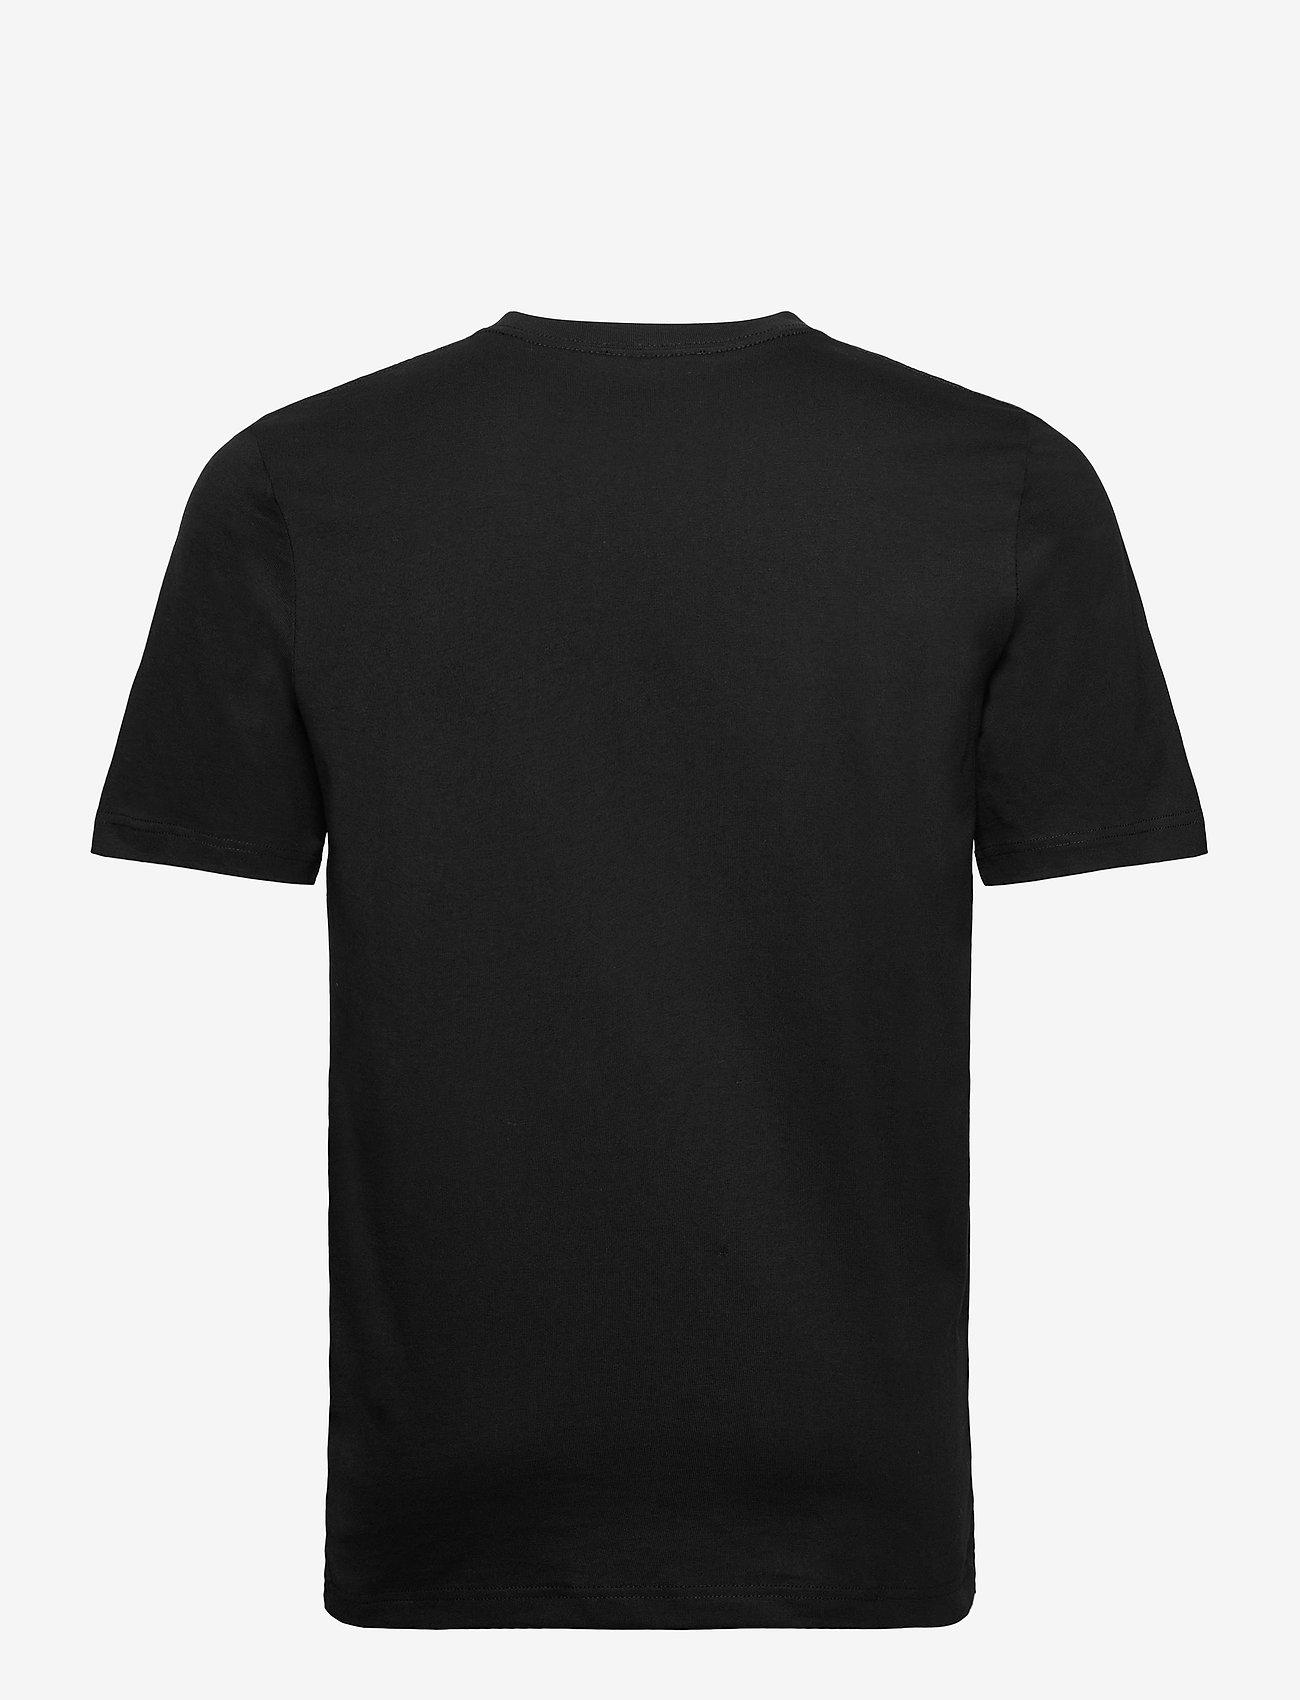 Jack & Jones - JPRBLASTUDIO SS TEE SOLID LTN - kortärmade t-shirts - black - 1